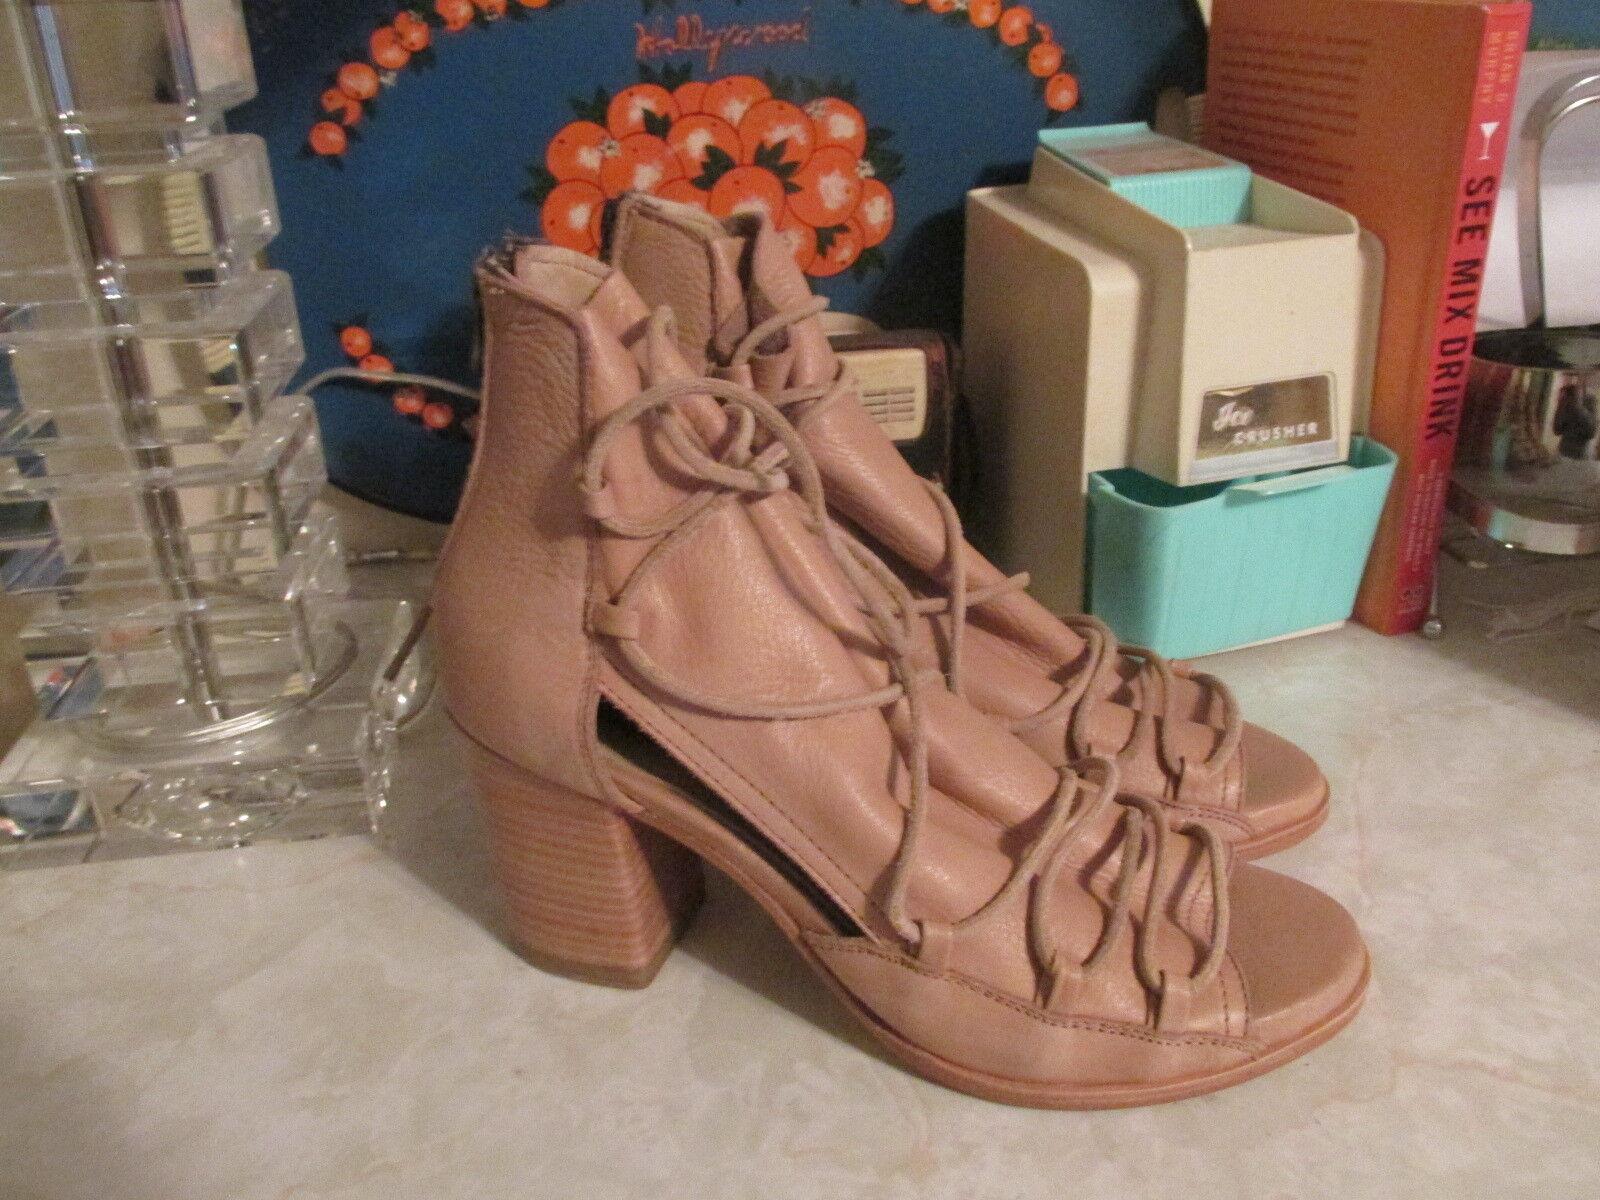 Baske Ariel Leather Lace Up Block Heel Sandal, size 8 fits like 9 NWOB